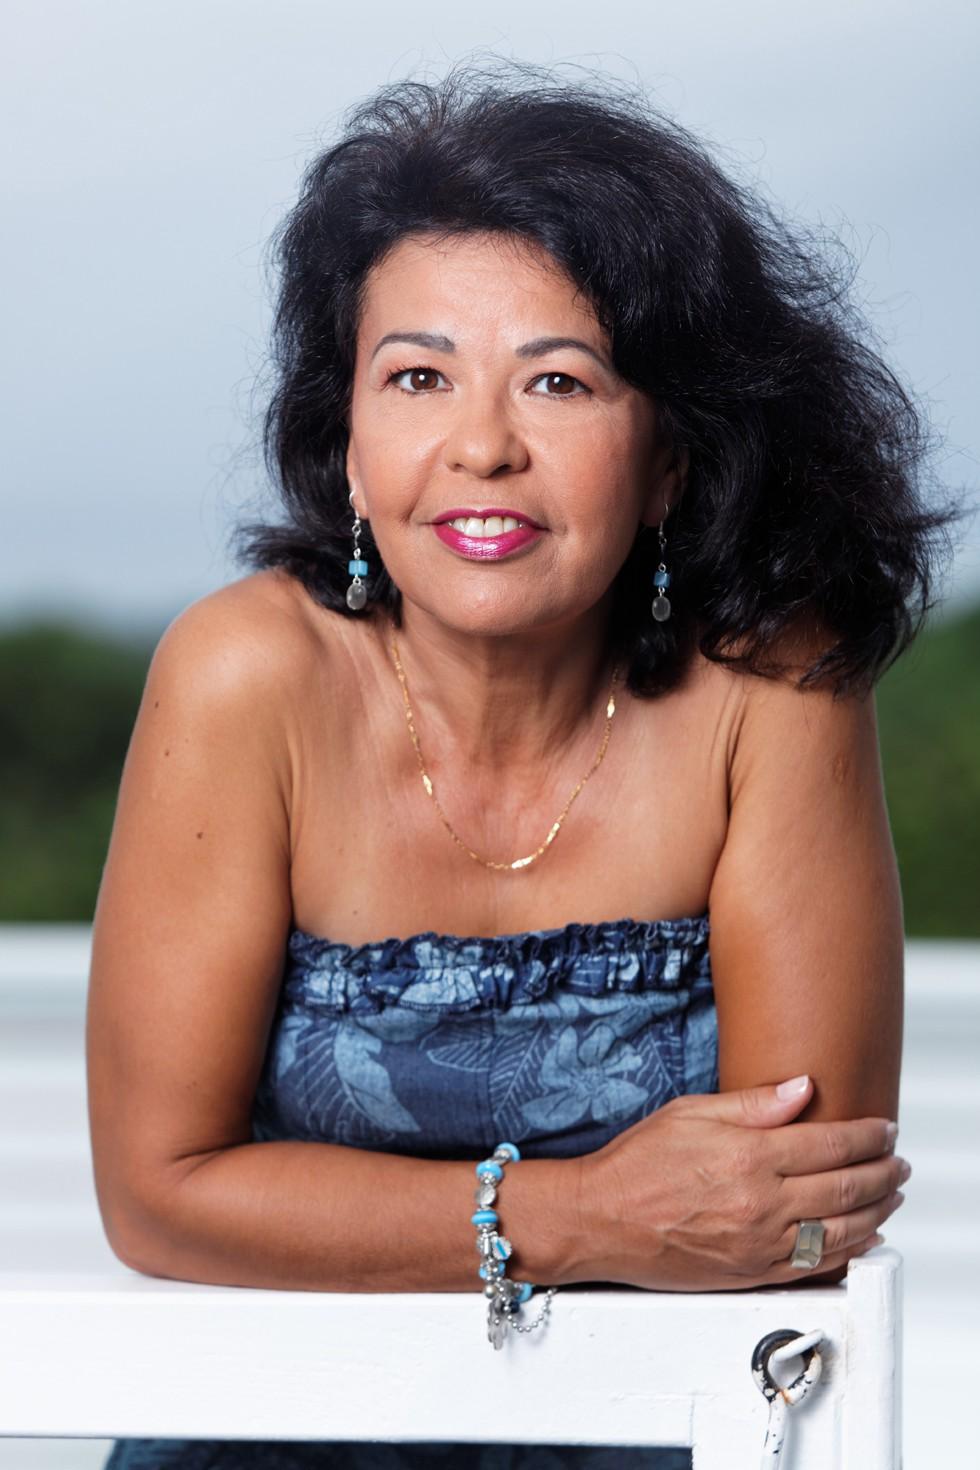 Ysabel Ferreira